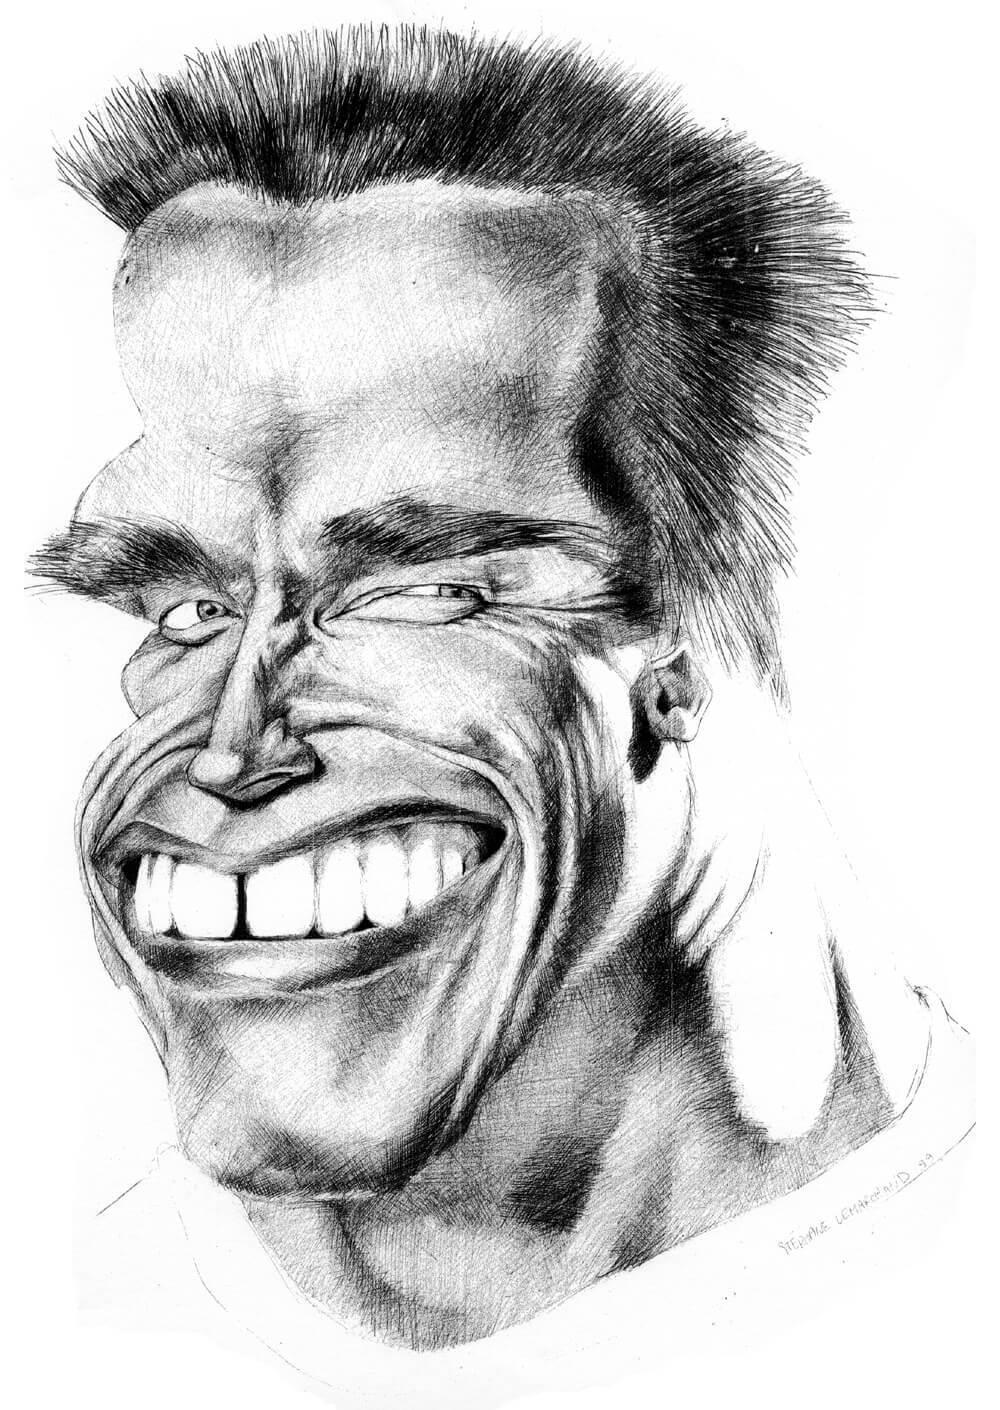 Caricature Homme caricature politique, caricature footballeur, caricature celebrites